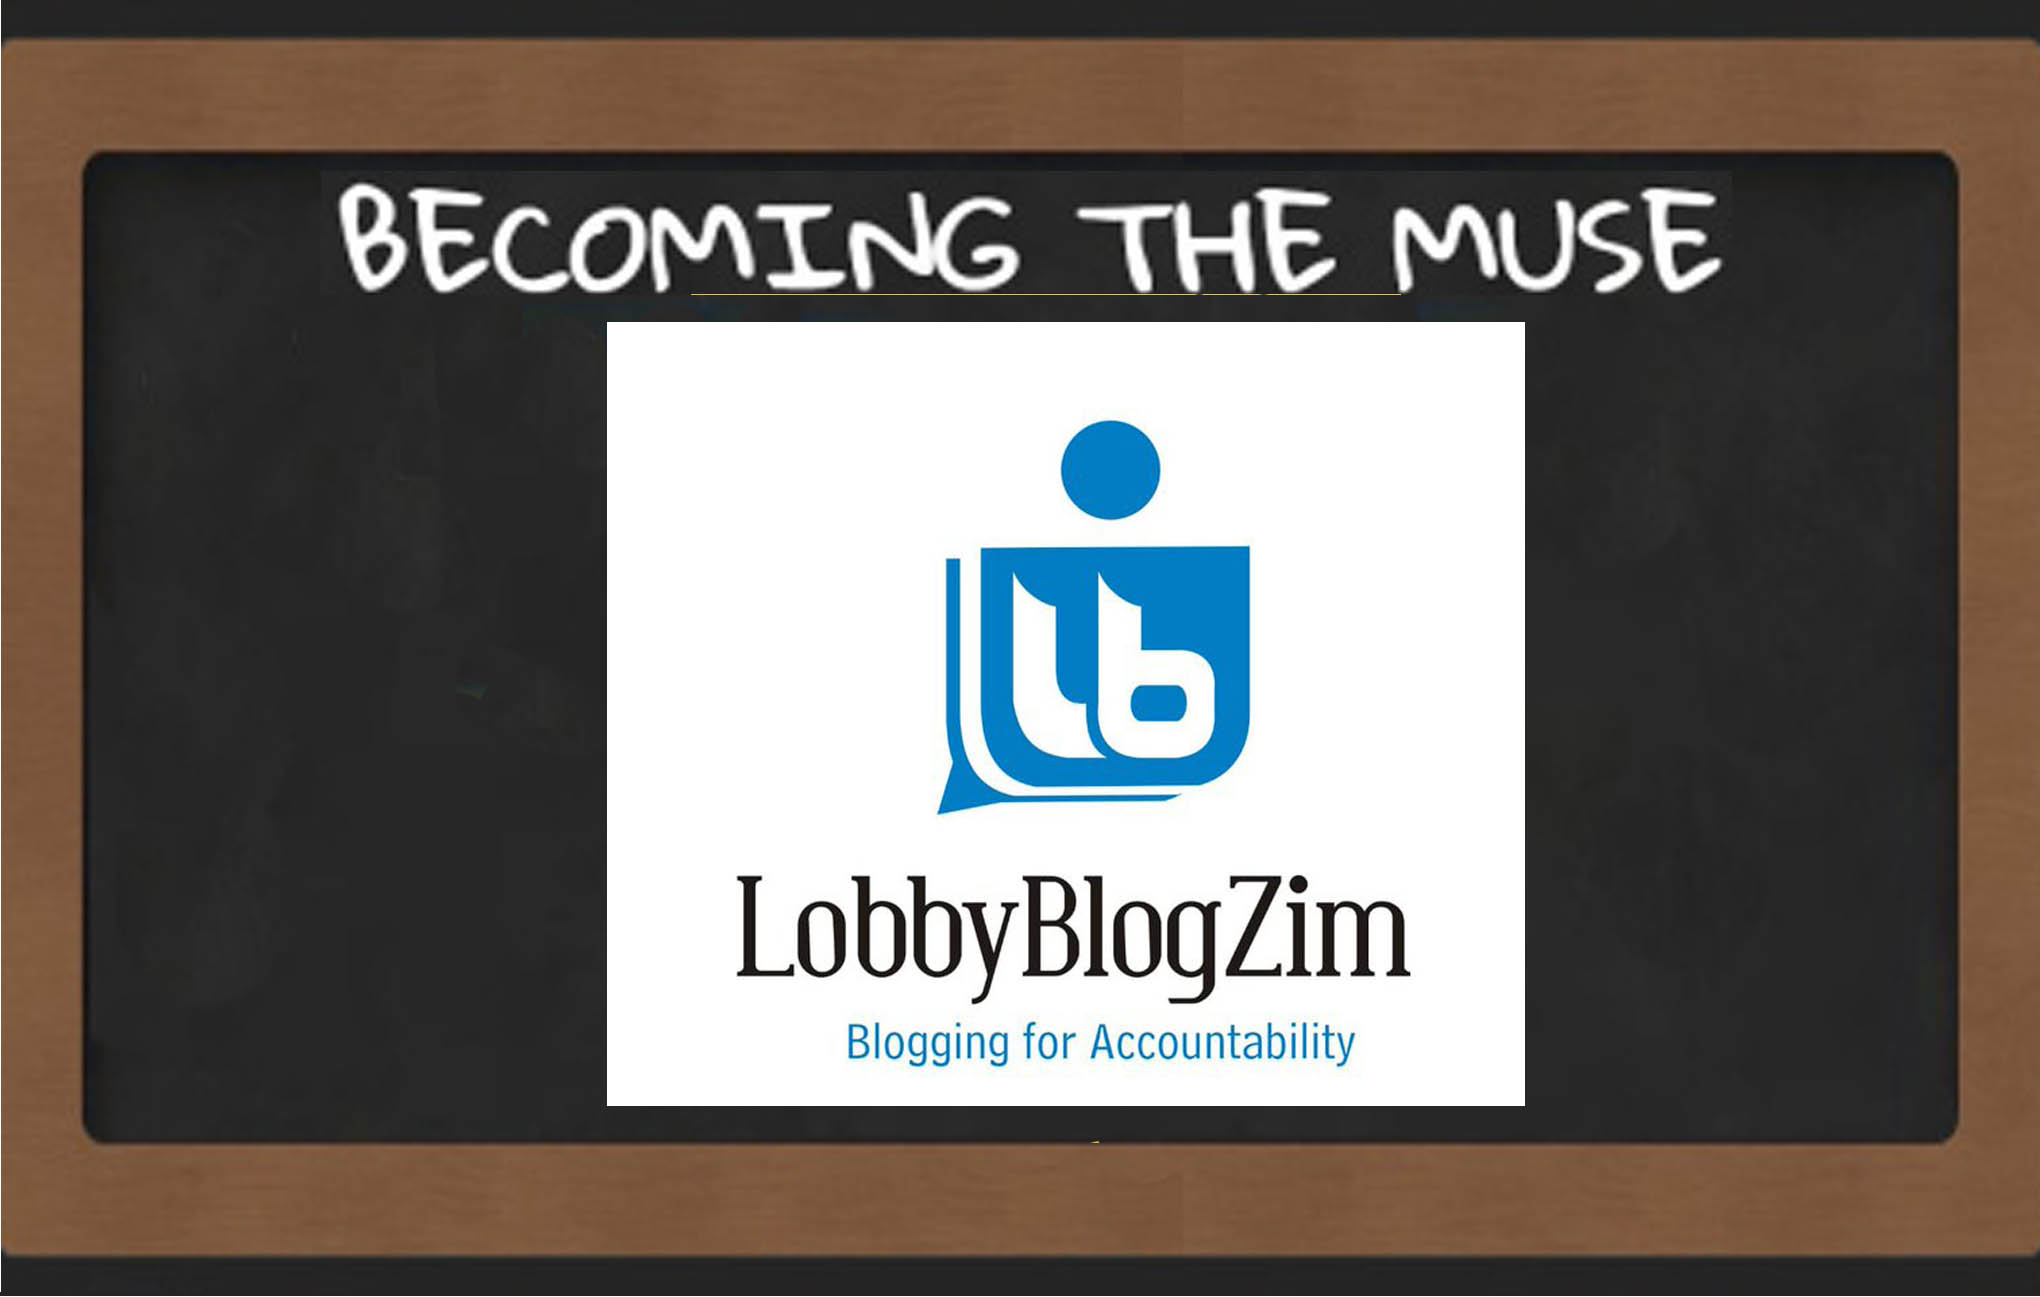 Blogging for accountability